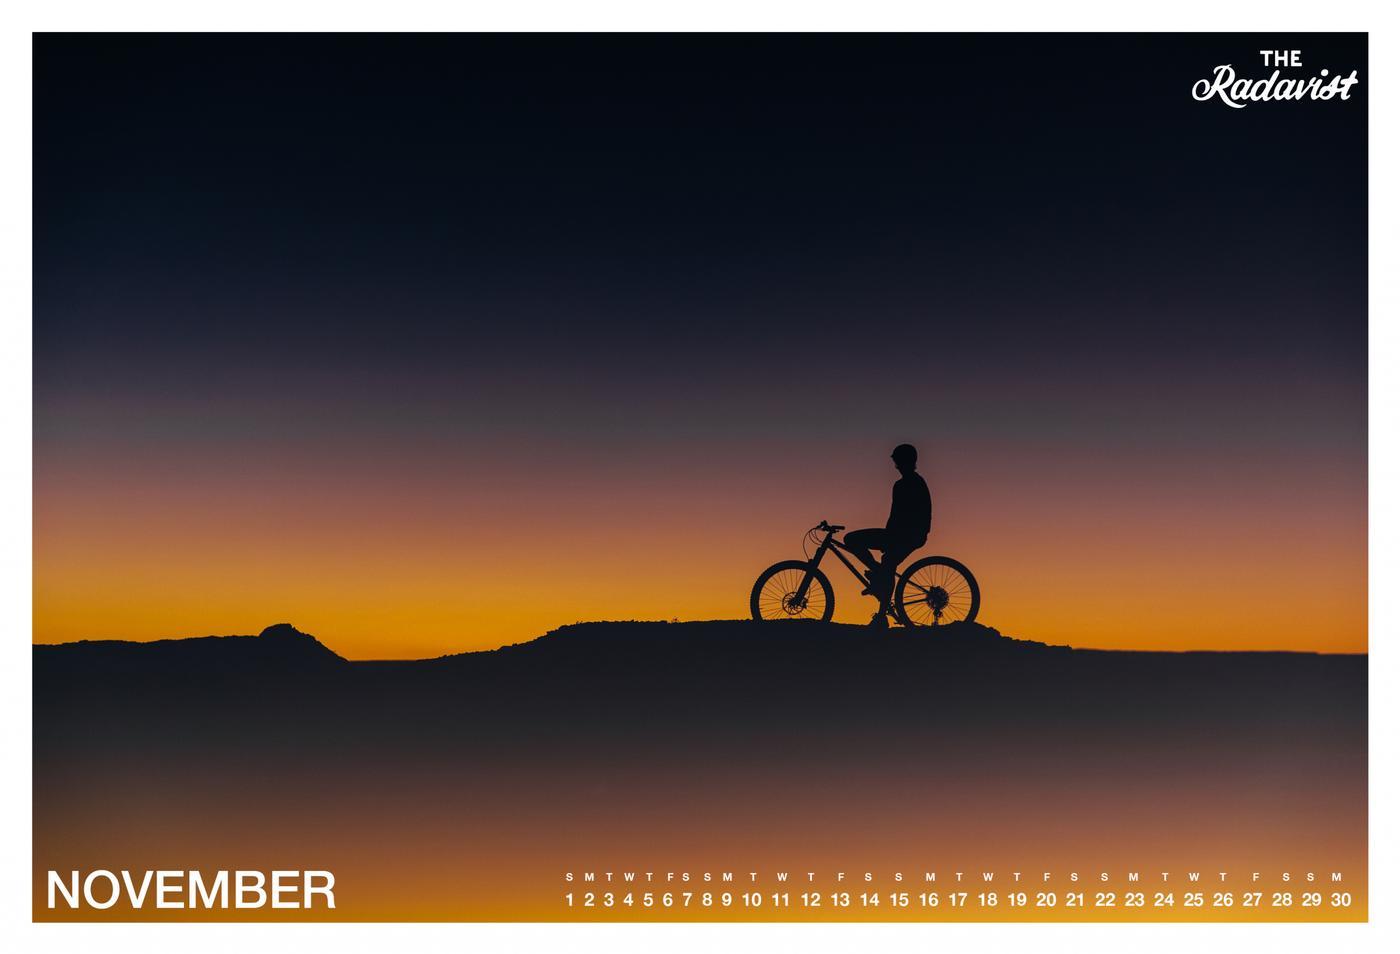 The Radavist 2020 Calendar: November